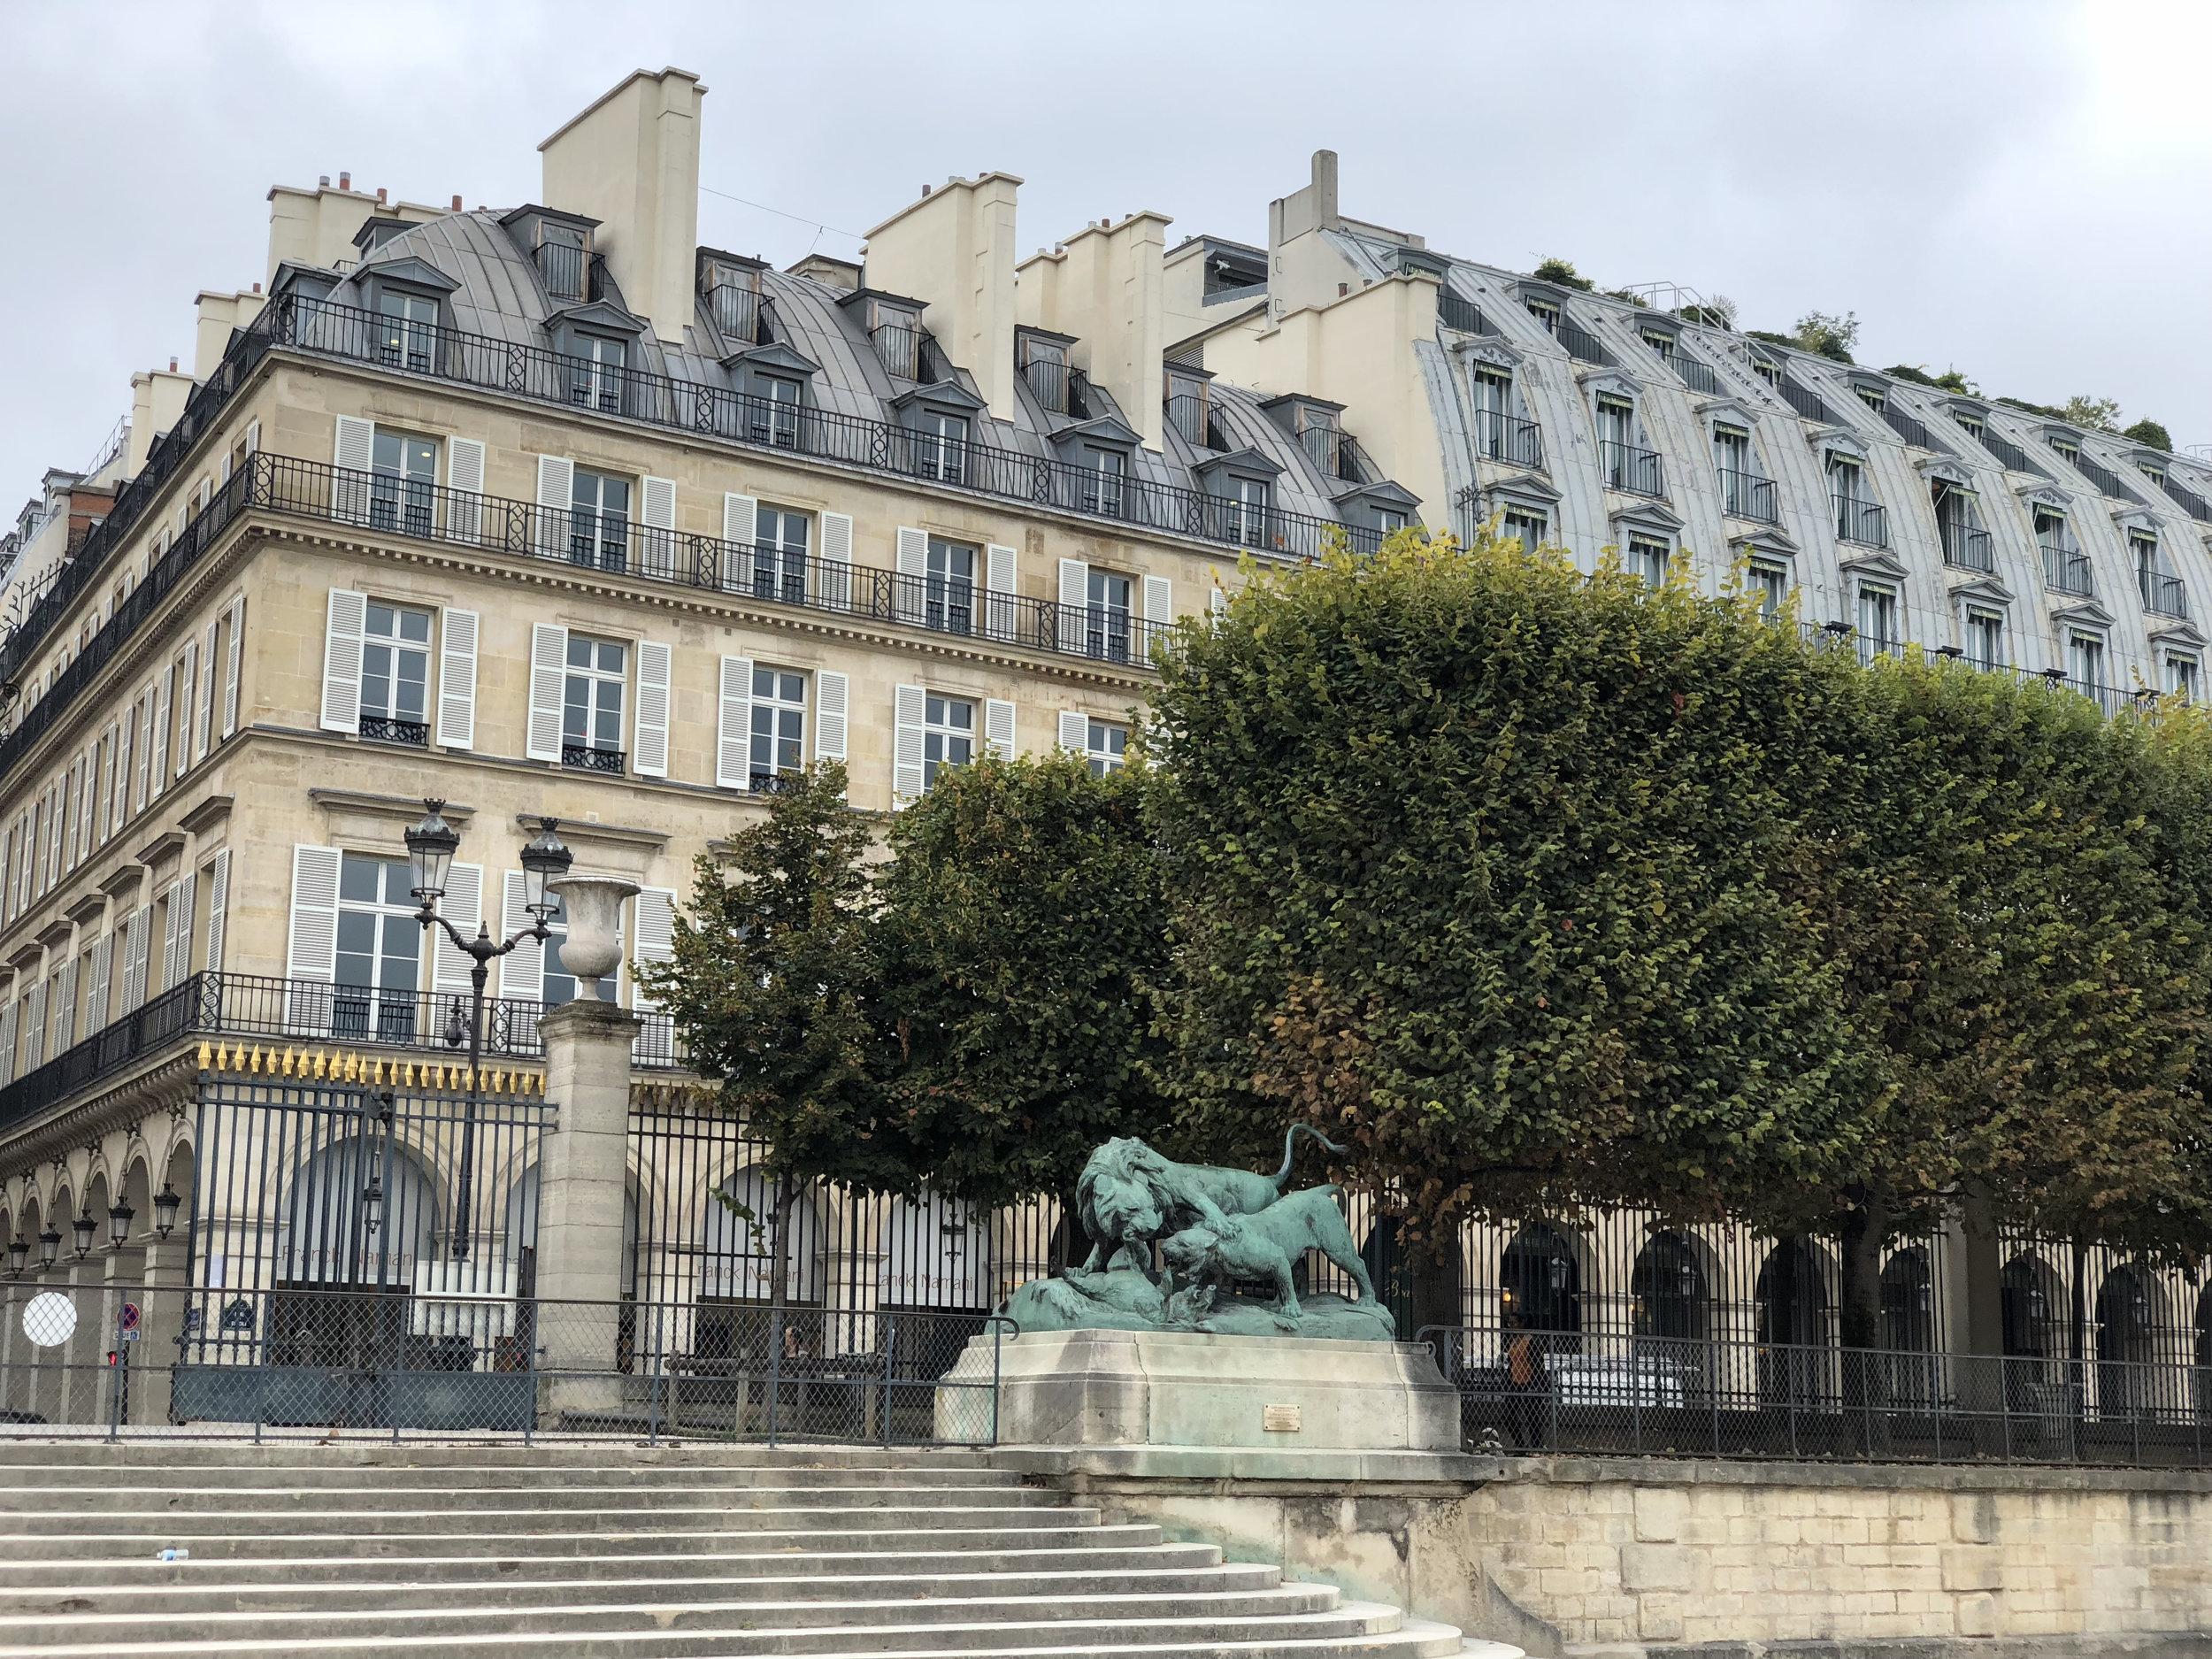 teri_Paris_laura'sbd_monet_giverny_l'orangerie_spiritedtable_photo84.jpg